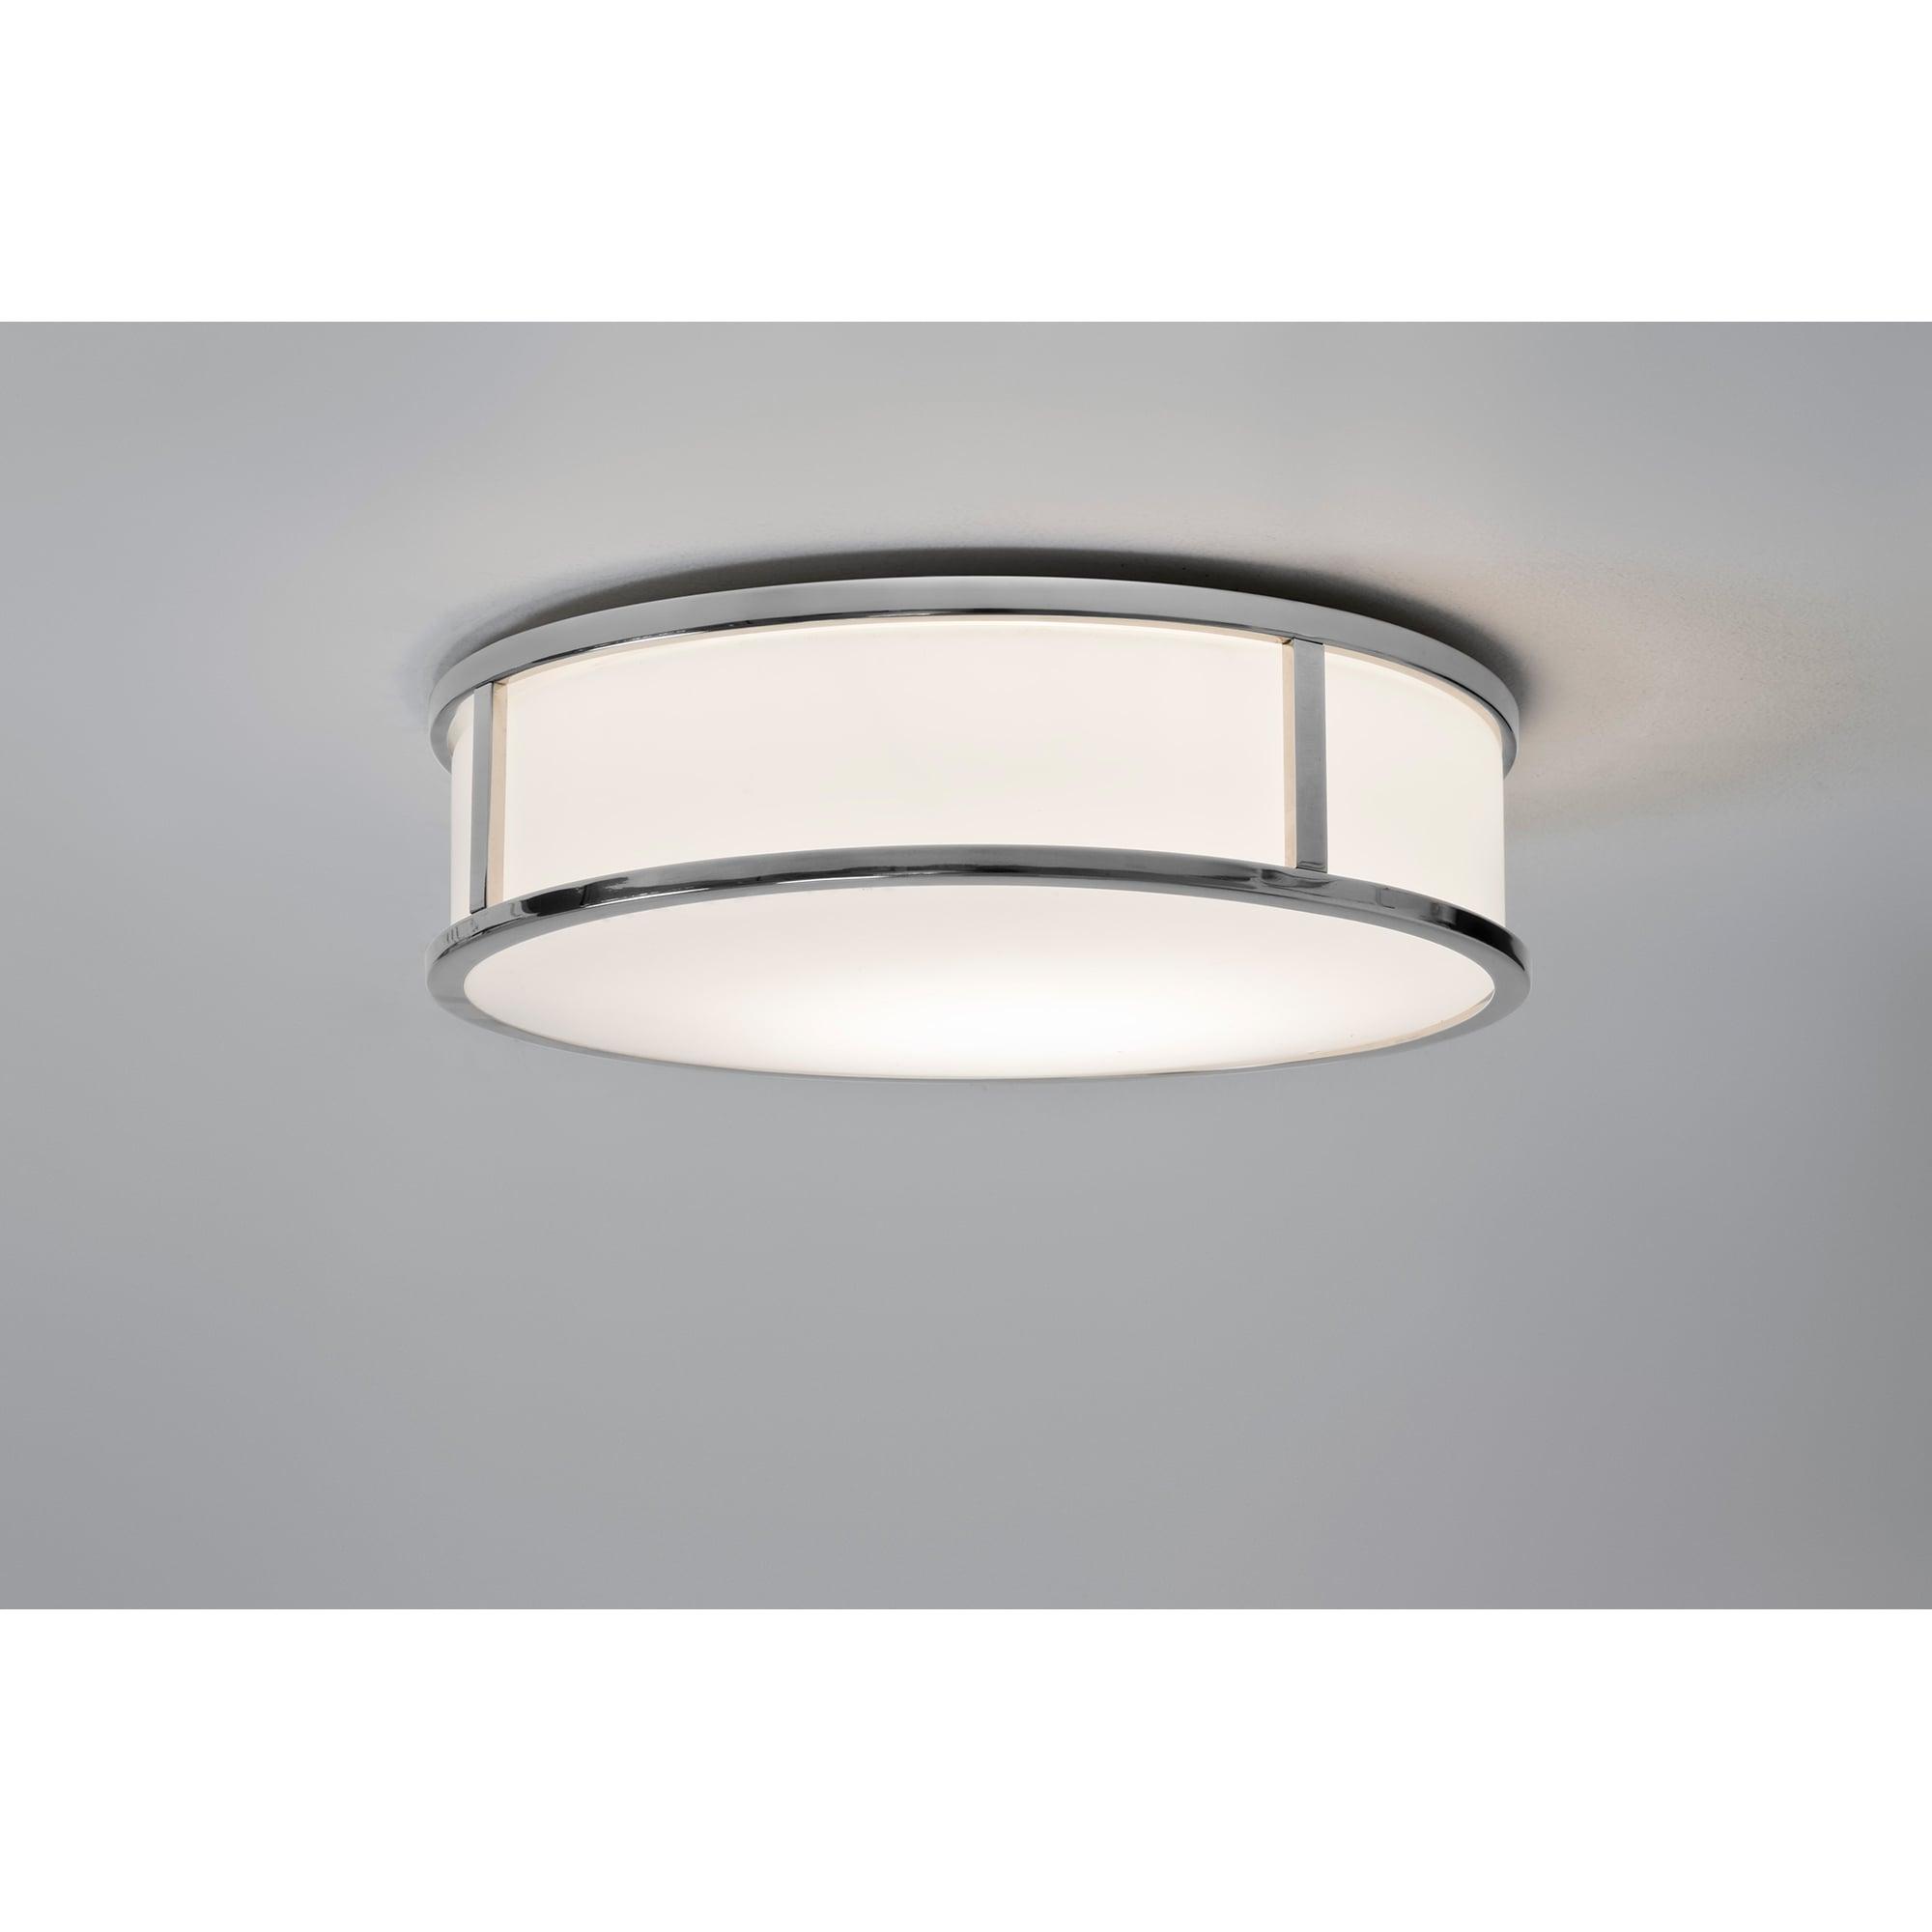 Astro 1121041 Mashiko Ii Round Single Led Bathroom Wall Ceiling Light In Polished Chrome Finish Castlegate Lights